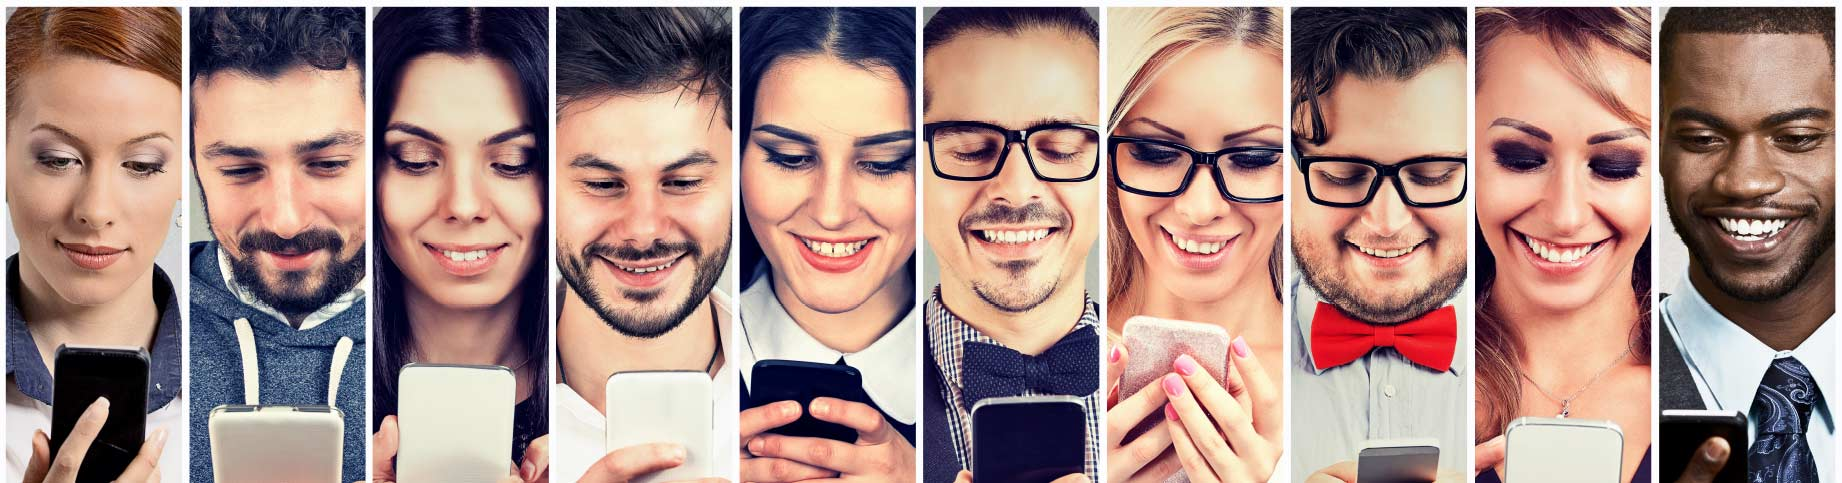 social-media-zielgruppen